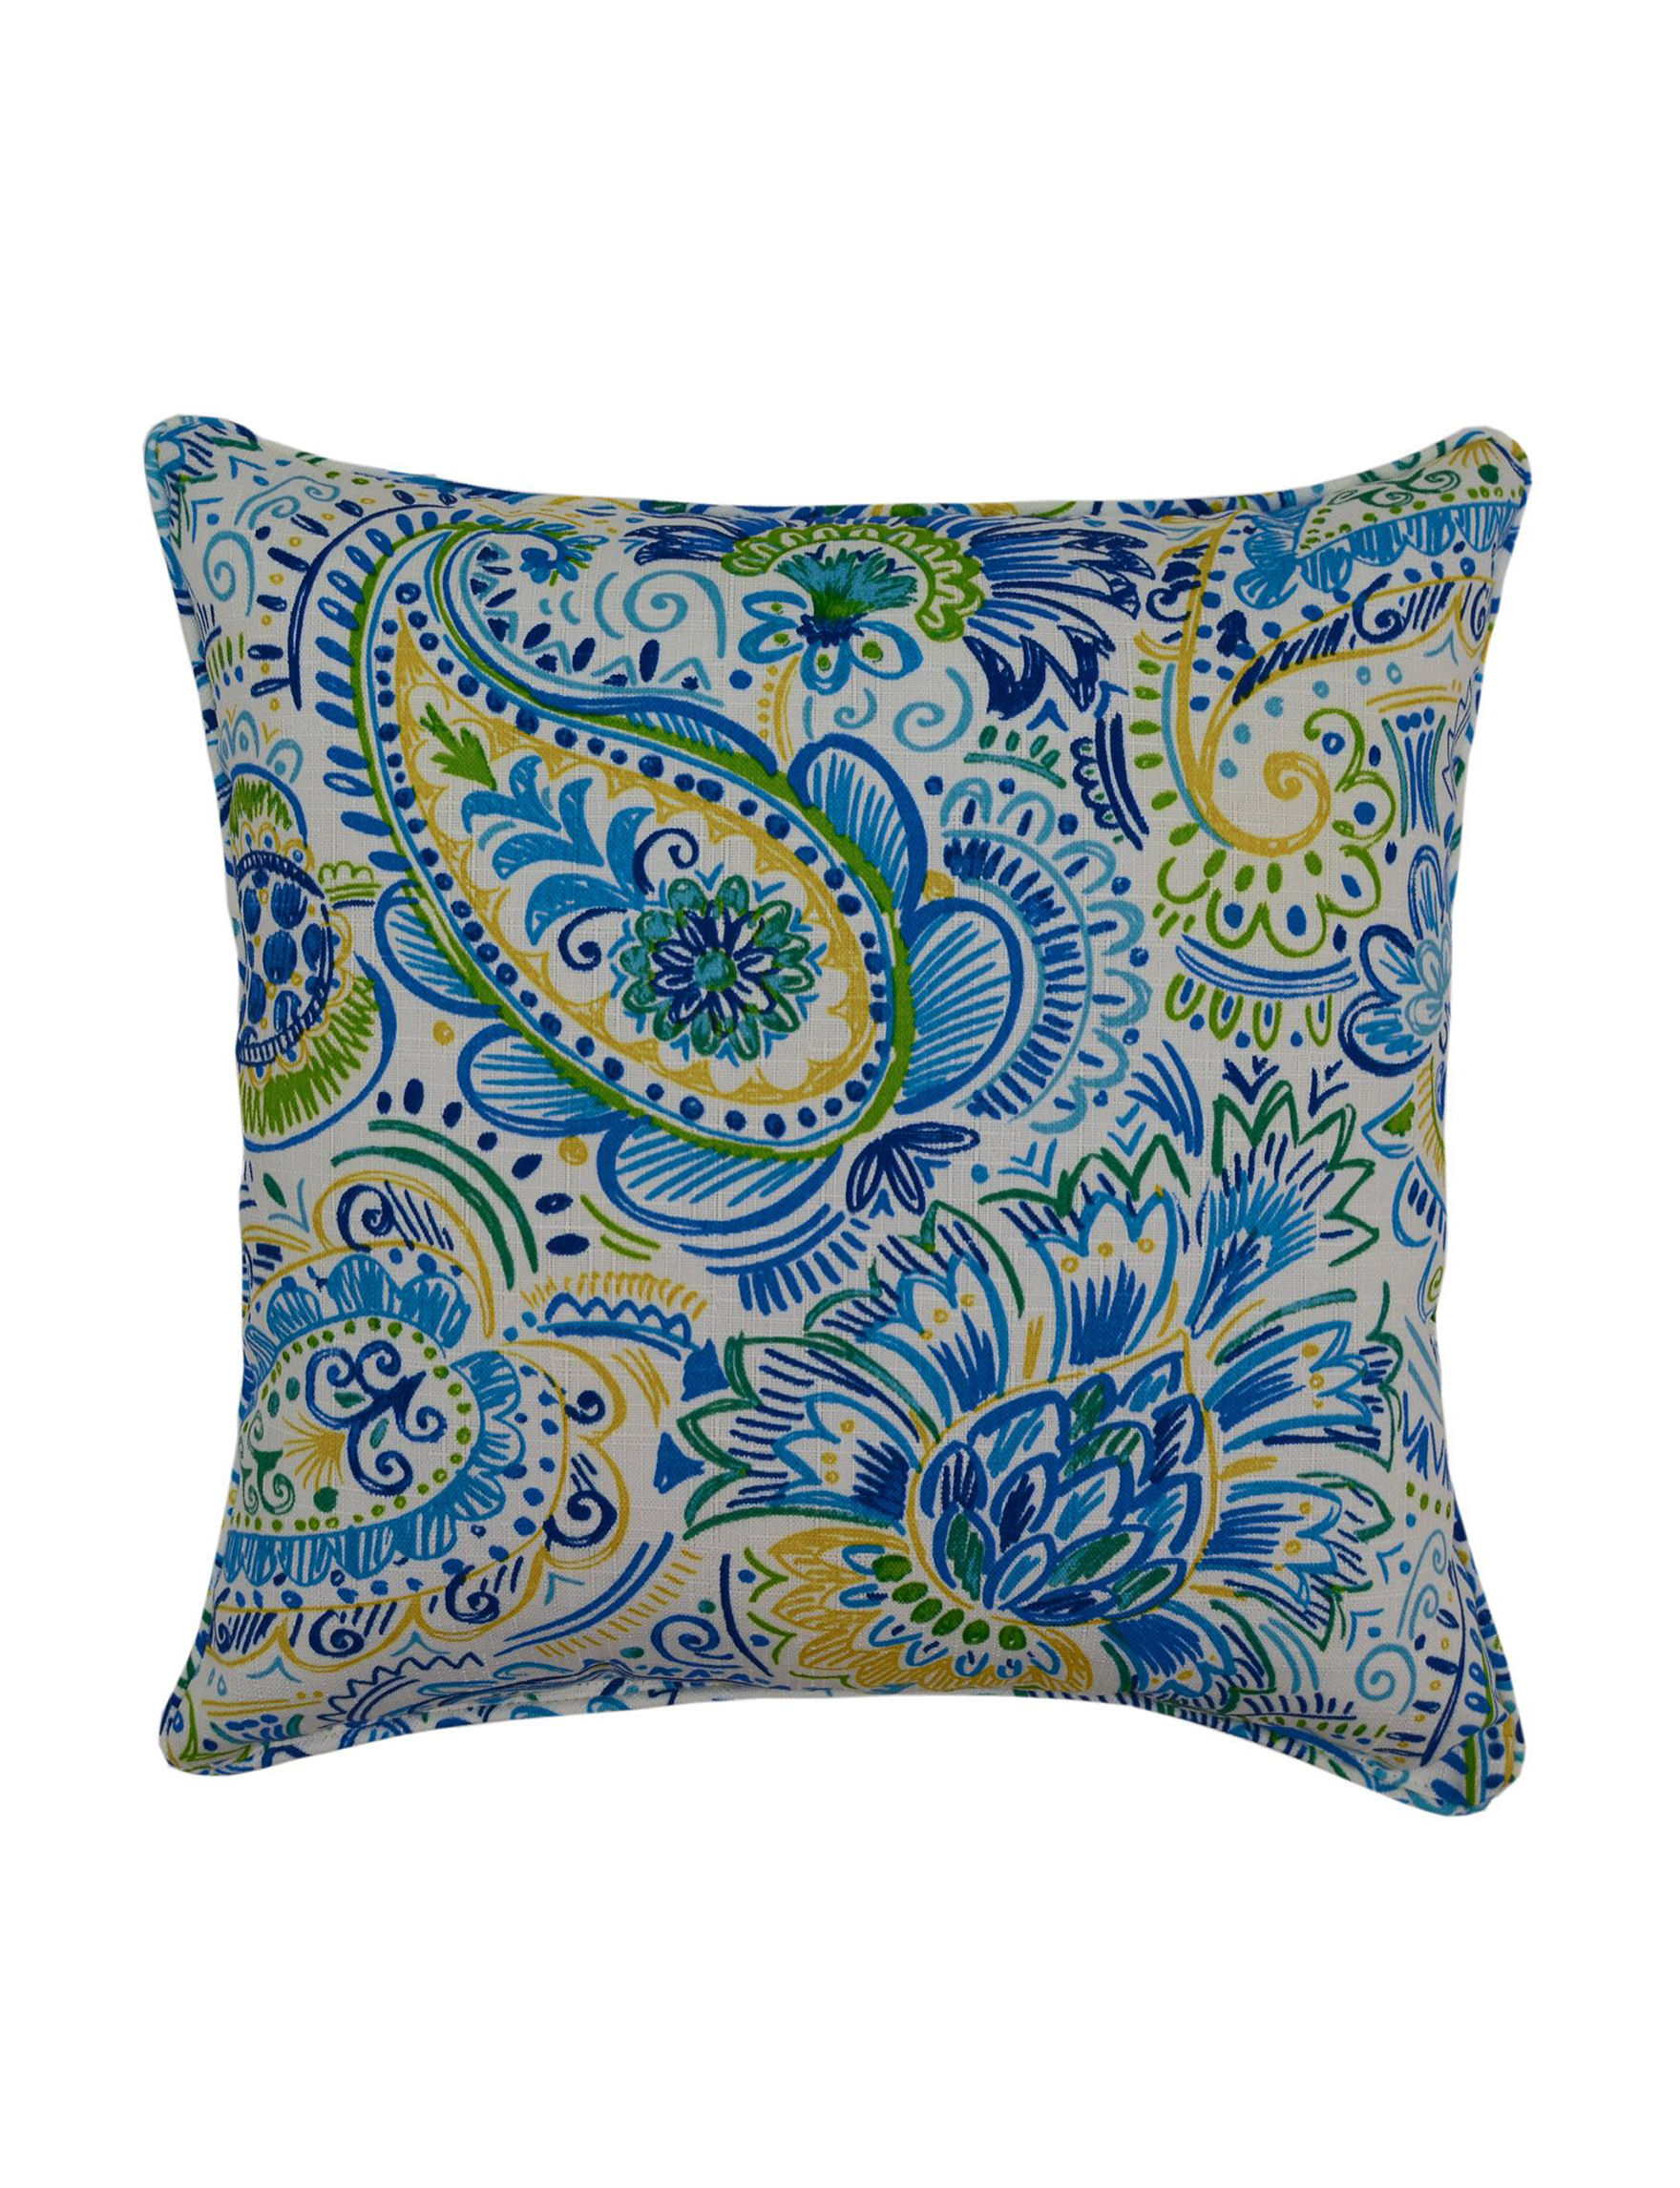 Creative Home Furnishings Blue Decorative Pillows